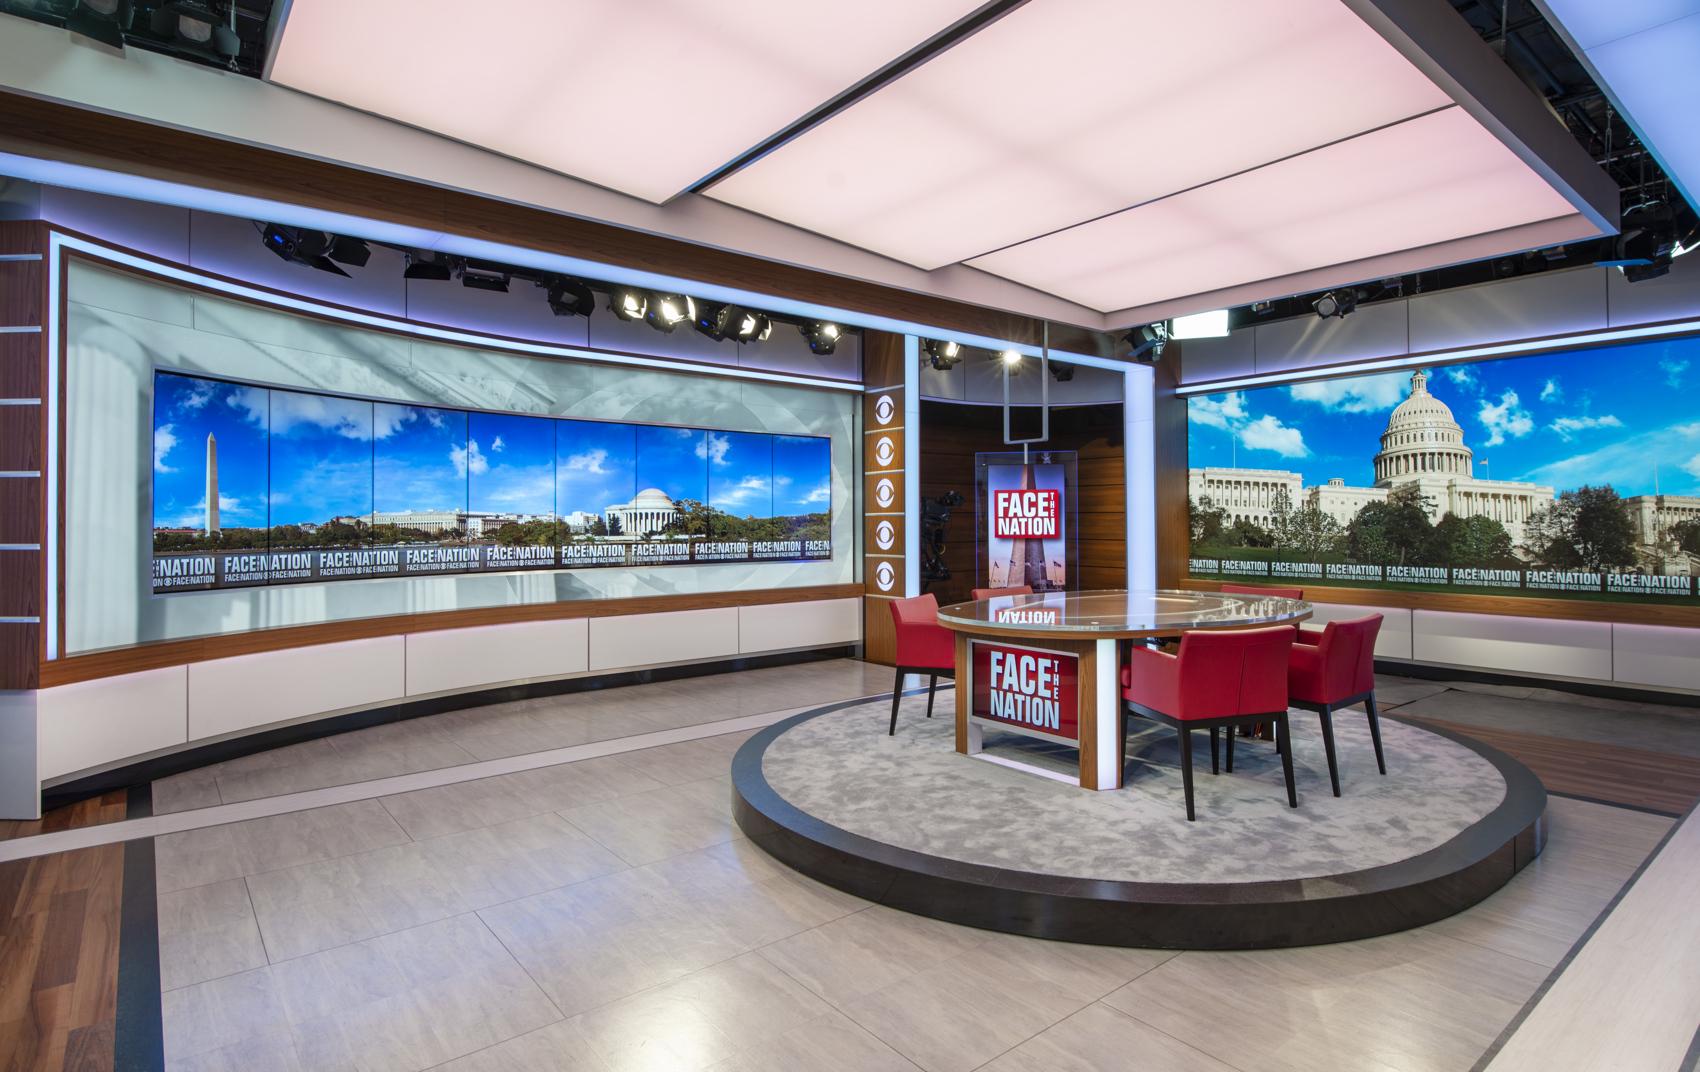 ncs_cbs-news_face-the-nation_tv-studio_0003